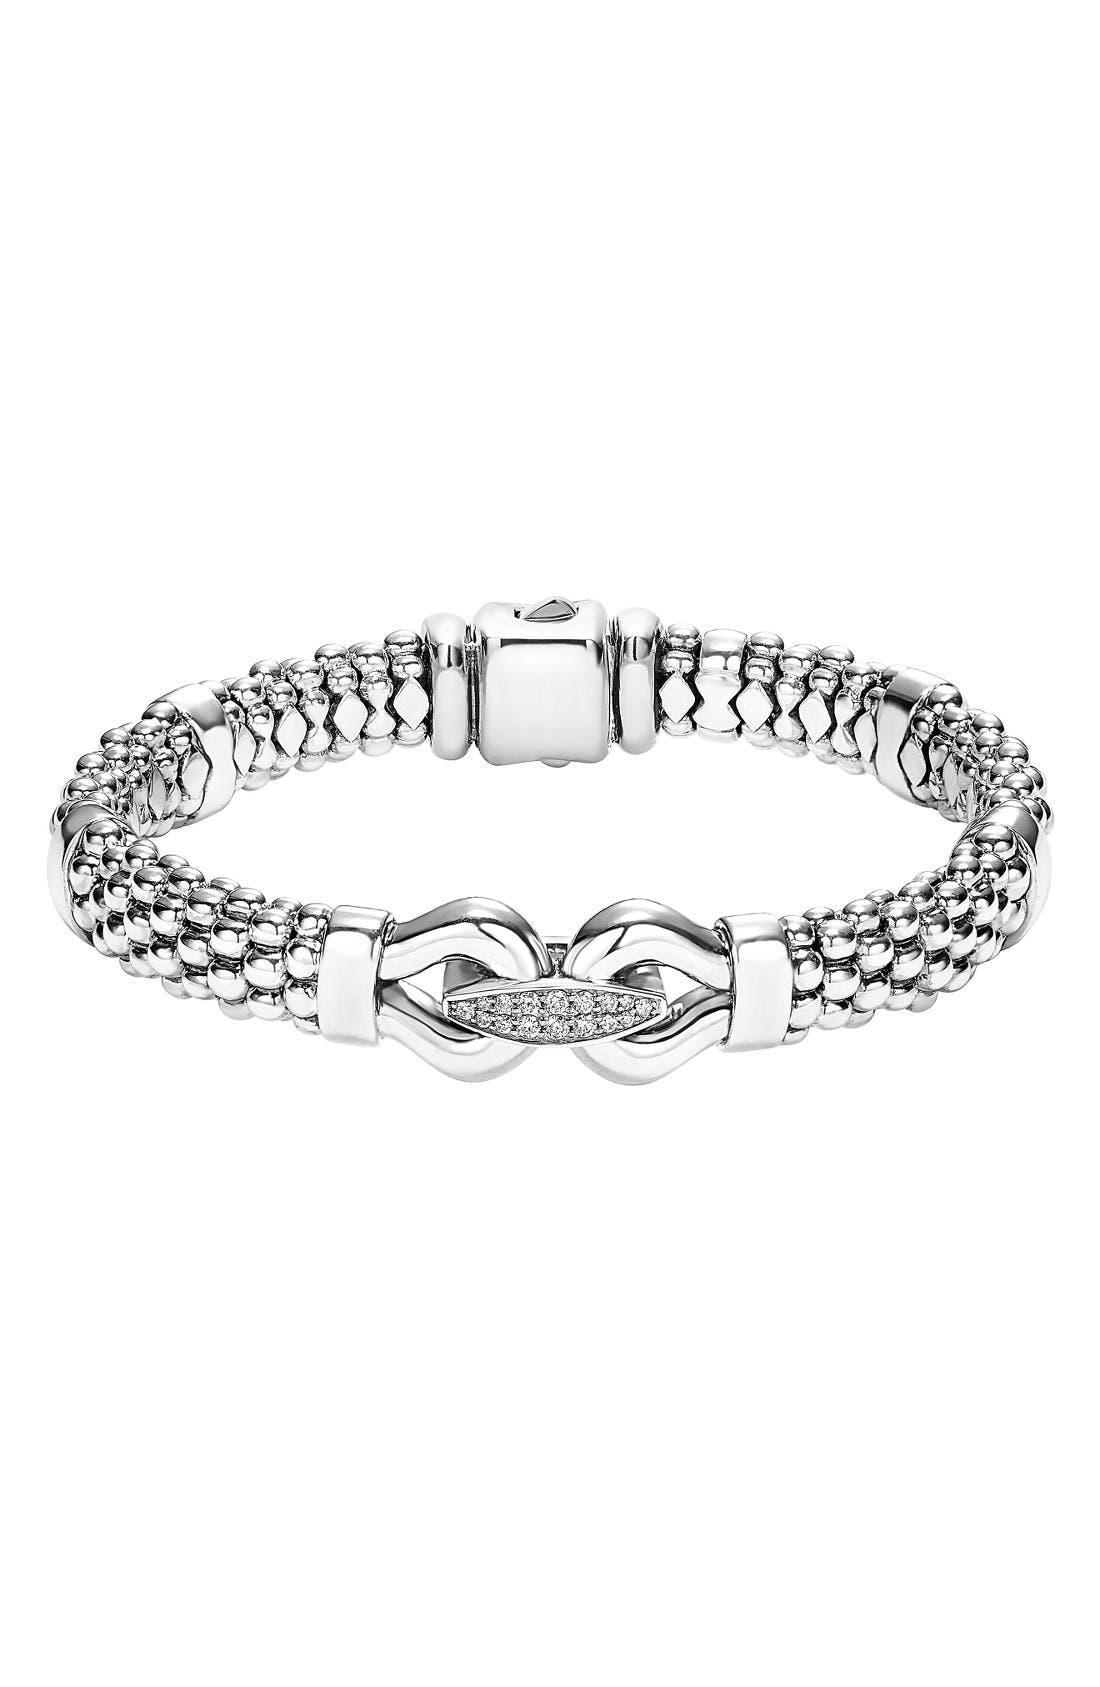 Alternate Image 1 Selected - LAGOS 'Derby' Diamond Buckle Rope Bracelet